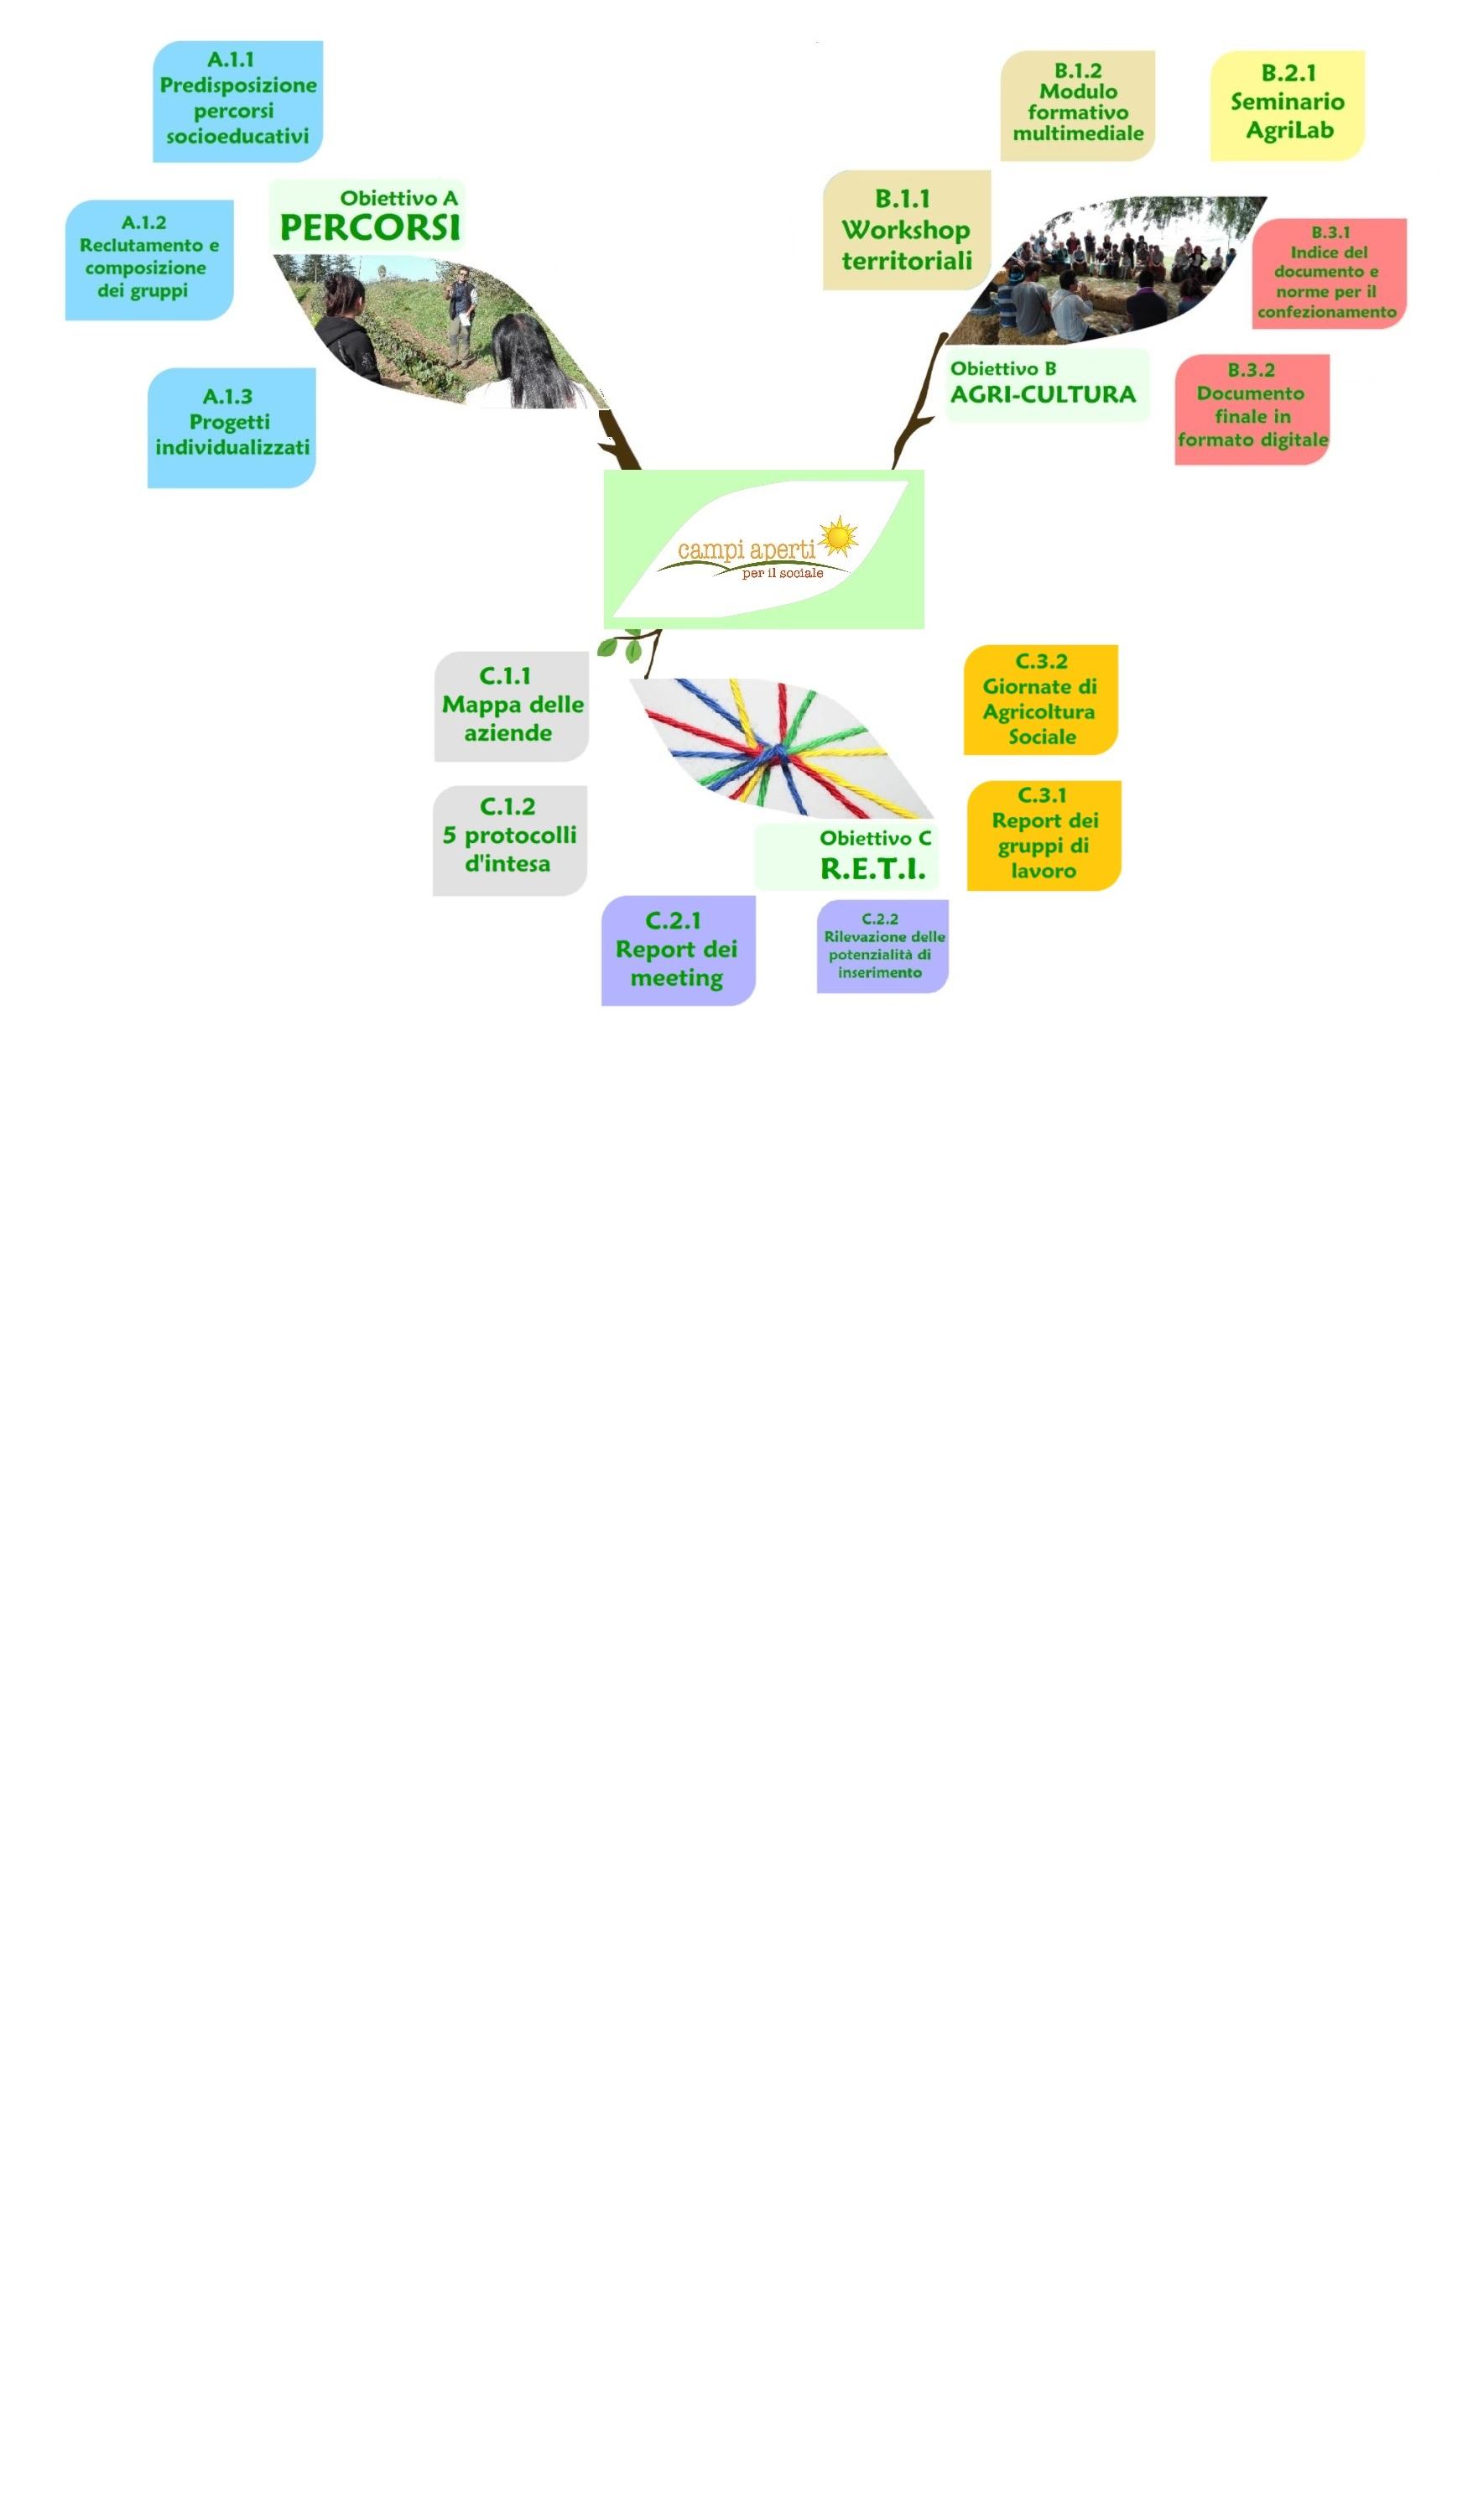 Mappa-concettuale-orizzontale-22